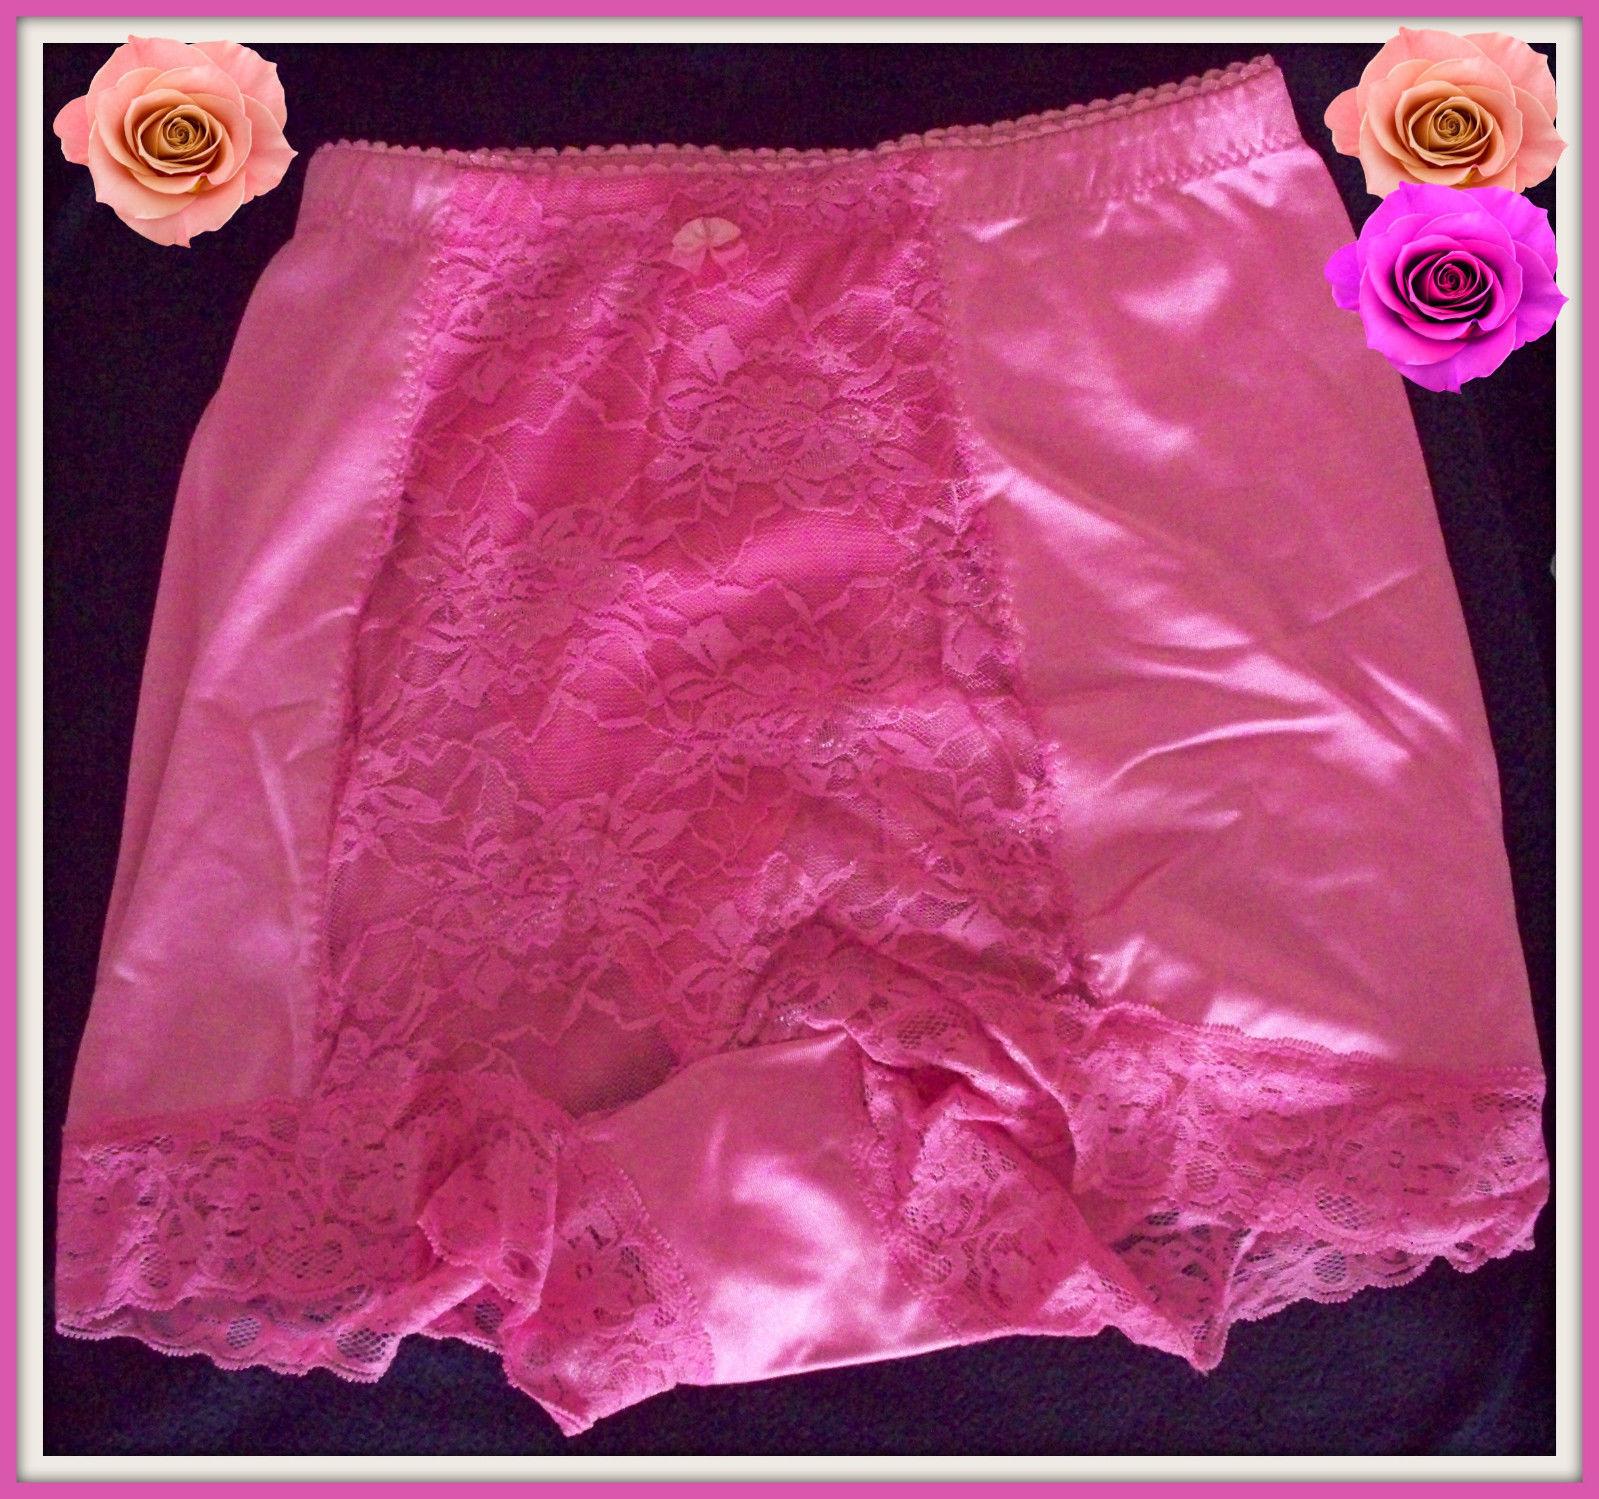 M Medium RHONDA SHEAR ROSE PINK Shabbie Chic LACE Control Brief PANTIE Boyshort  - $9.99